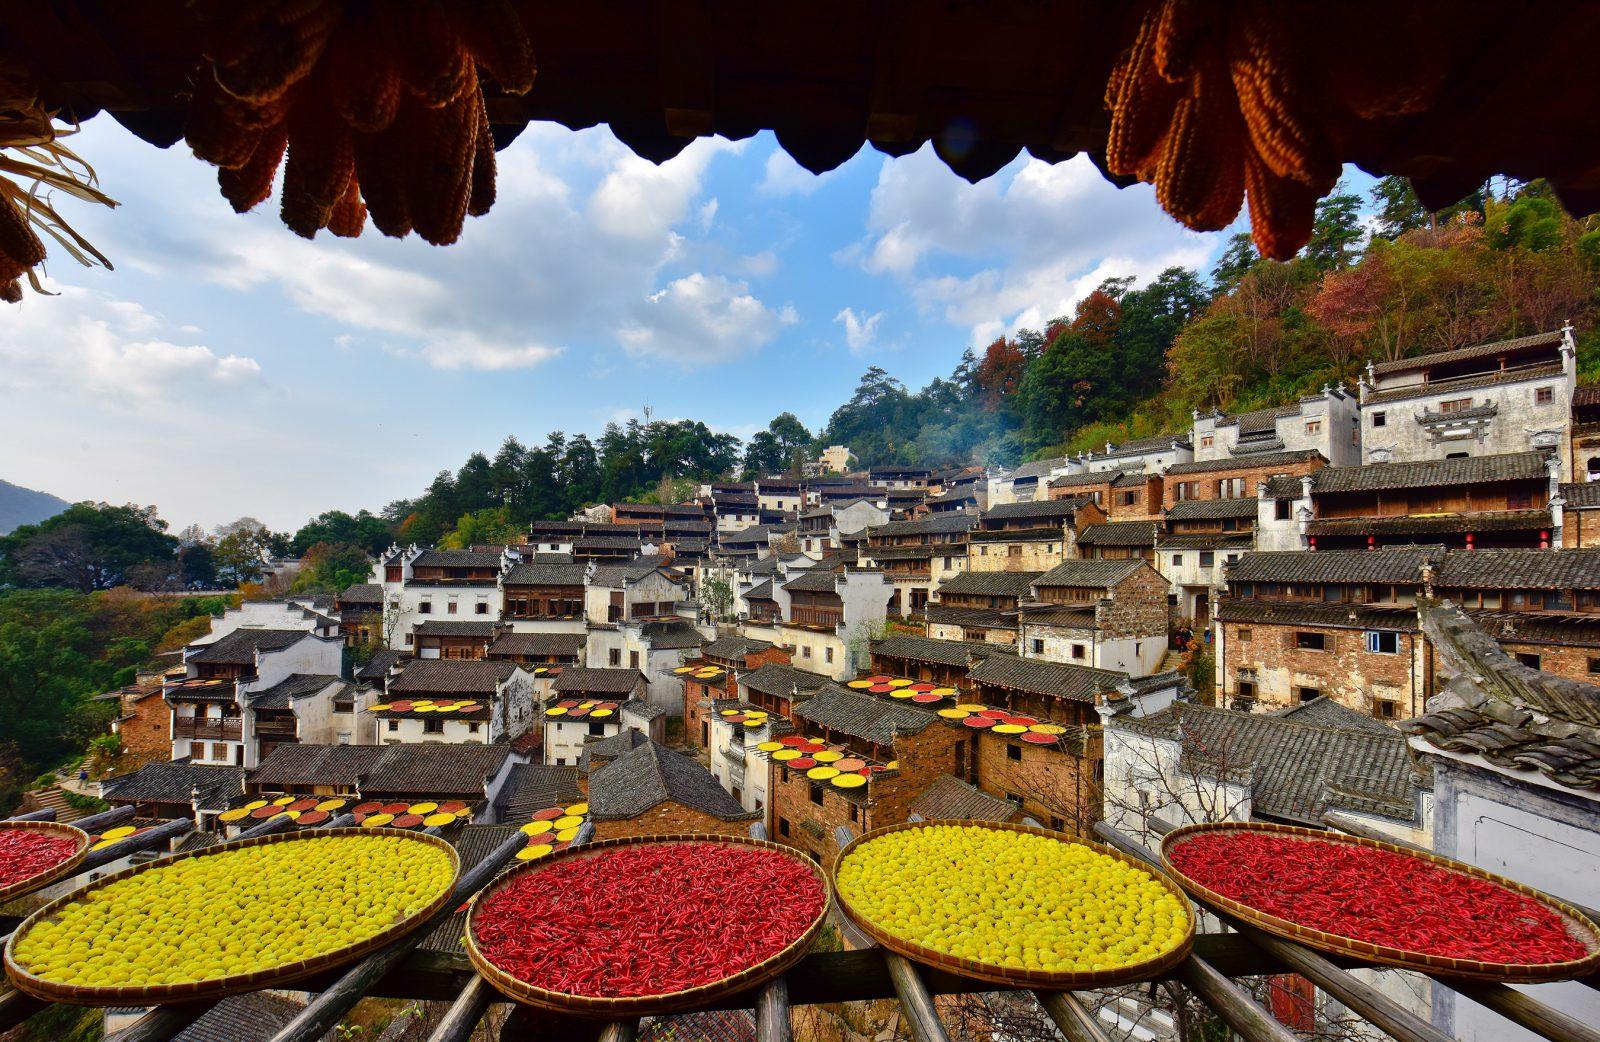 huangling china rural